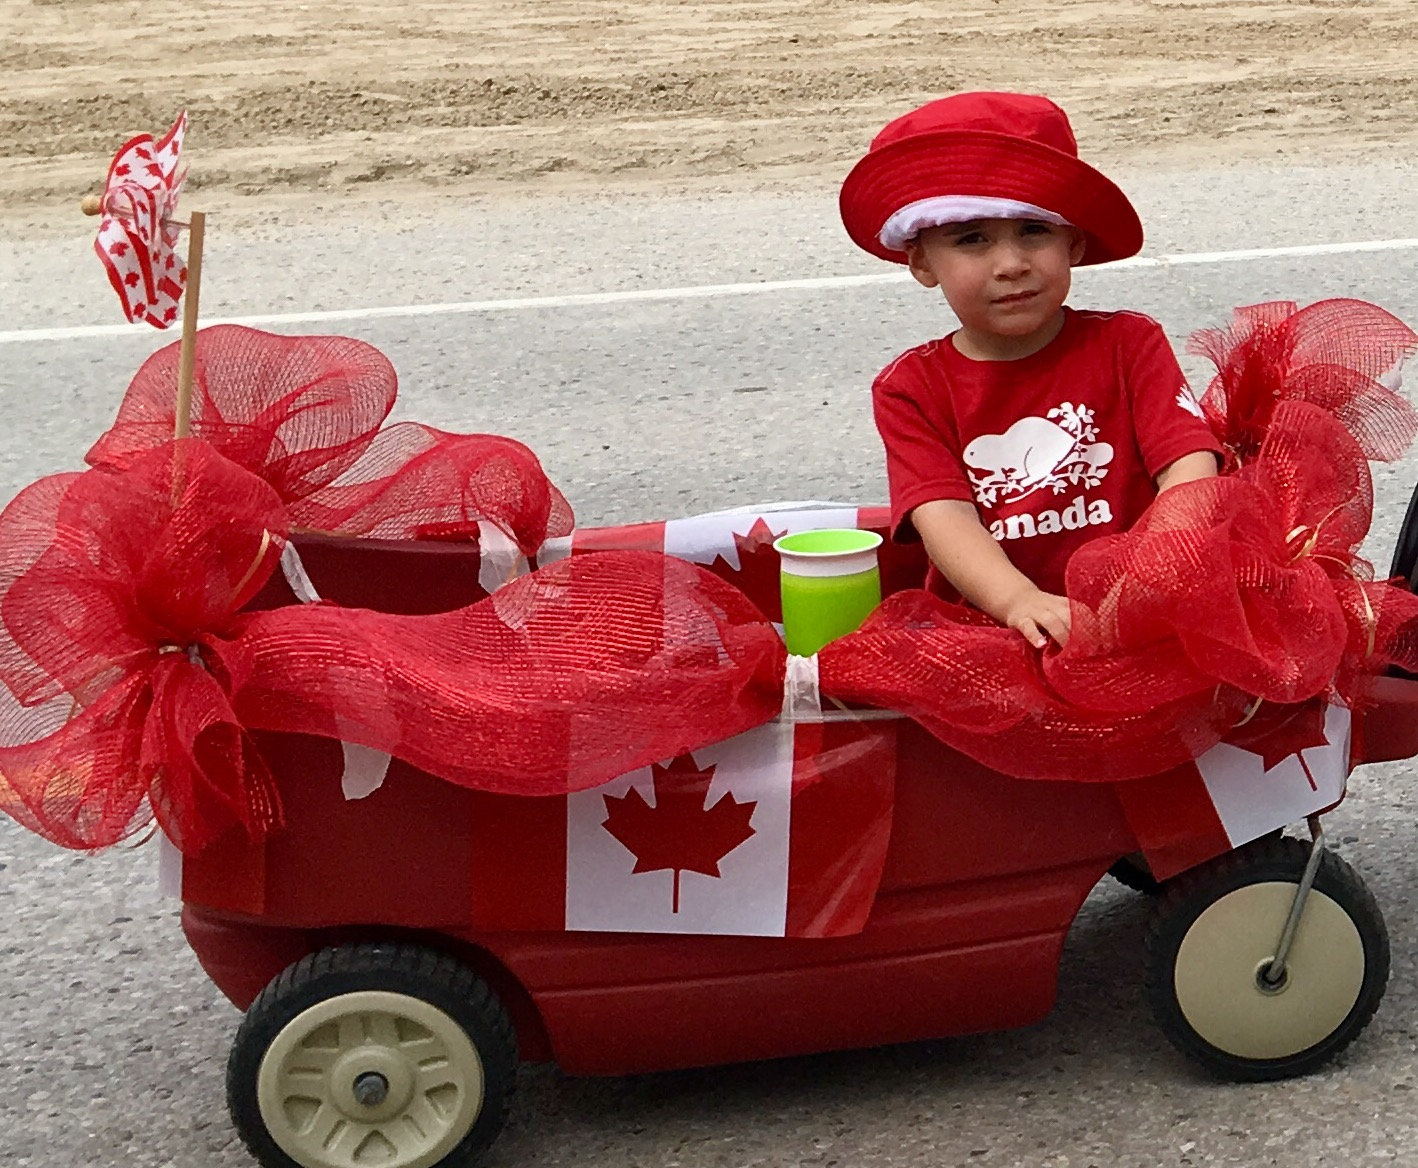 Canada Day Ipperwash 150 years Celebration